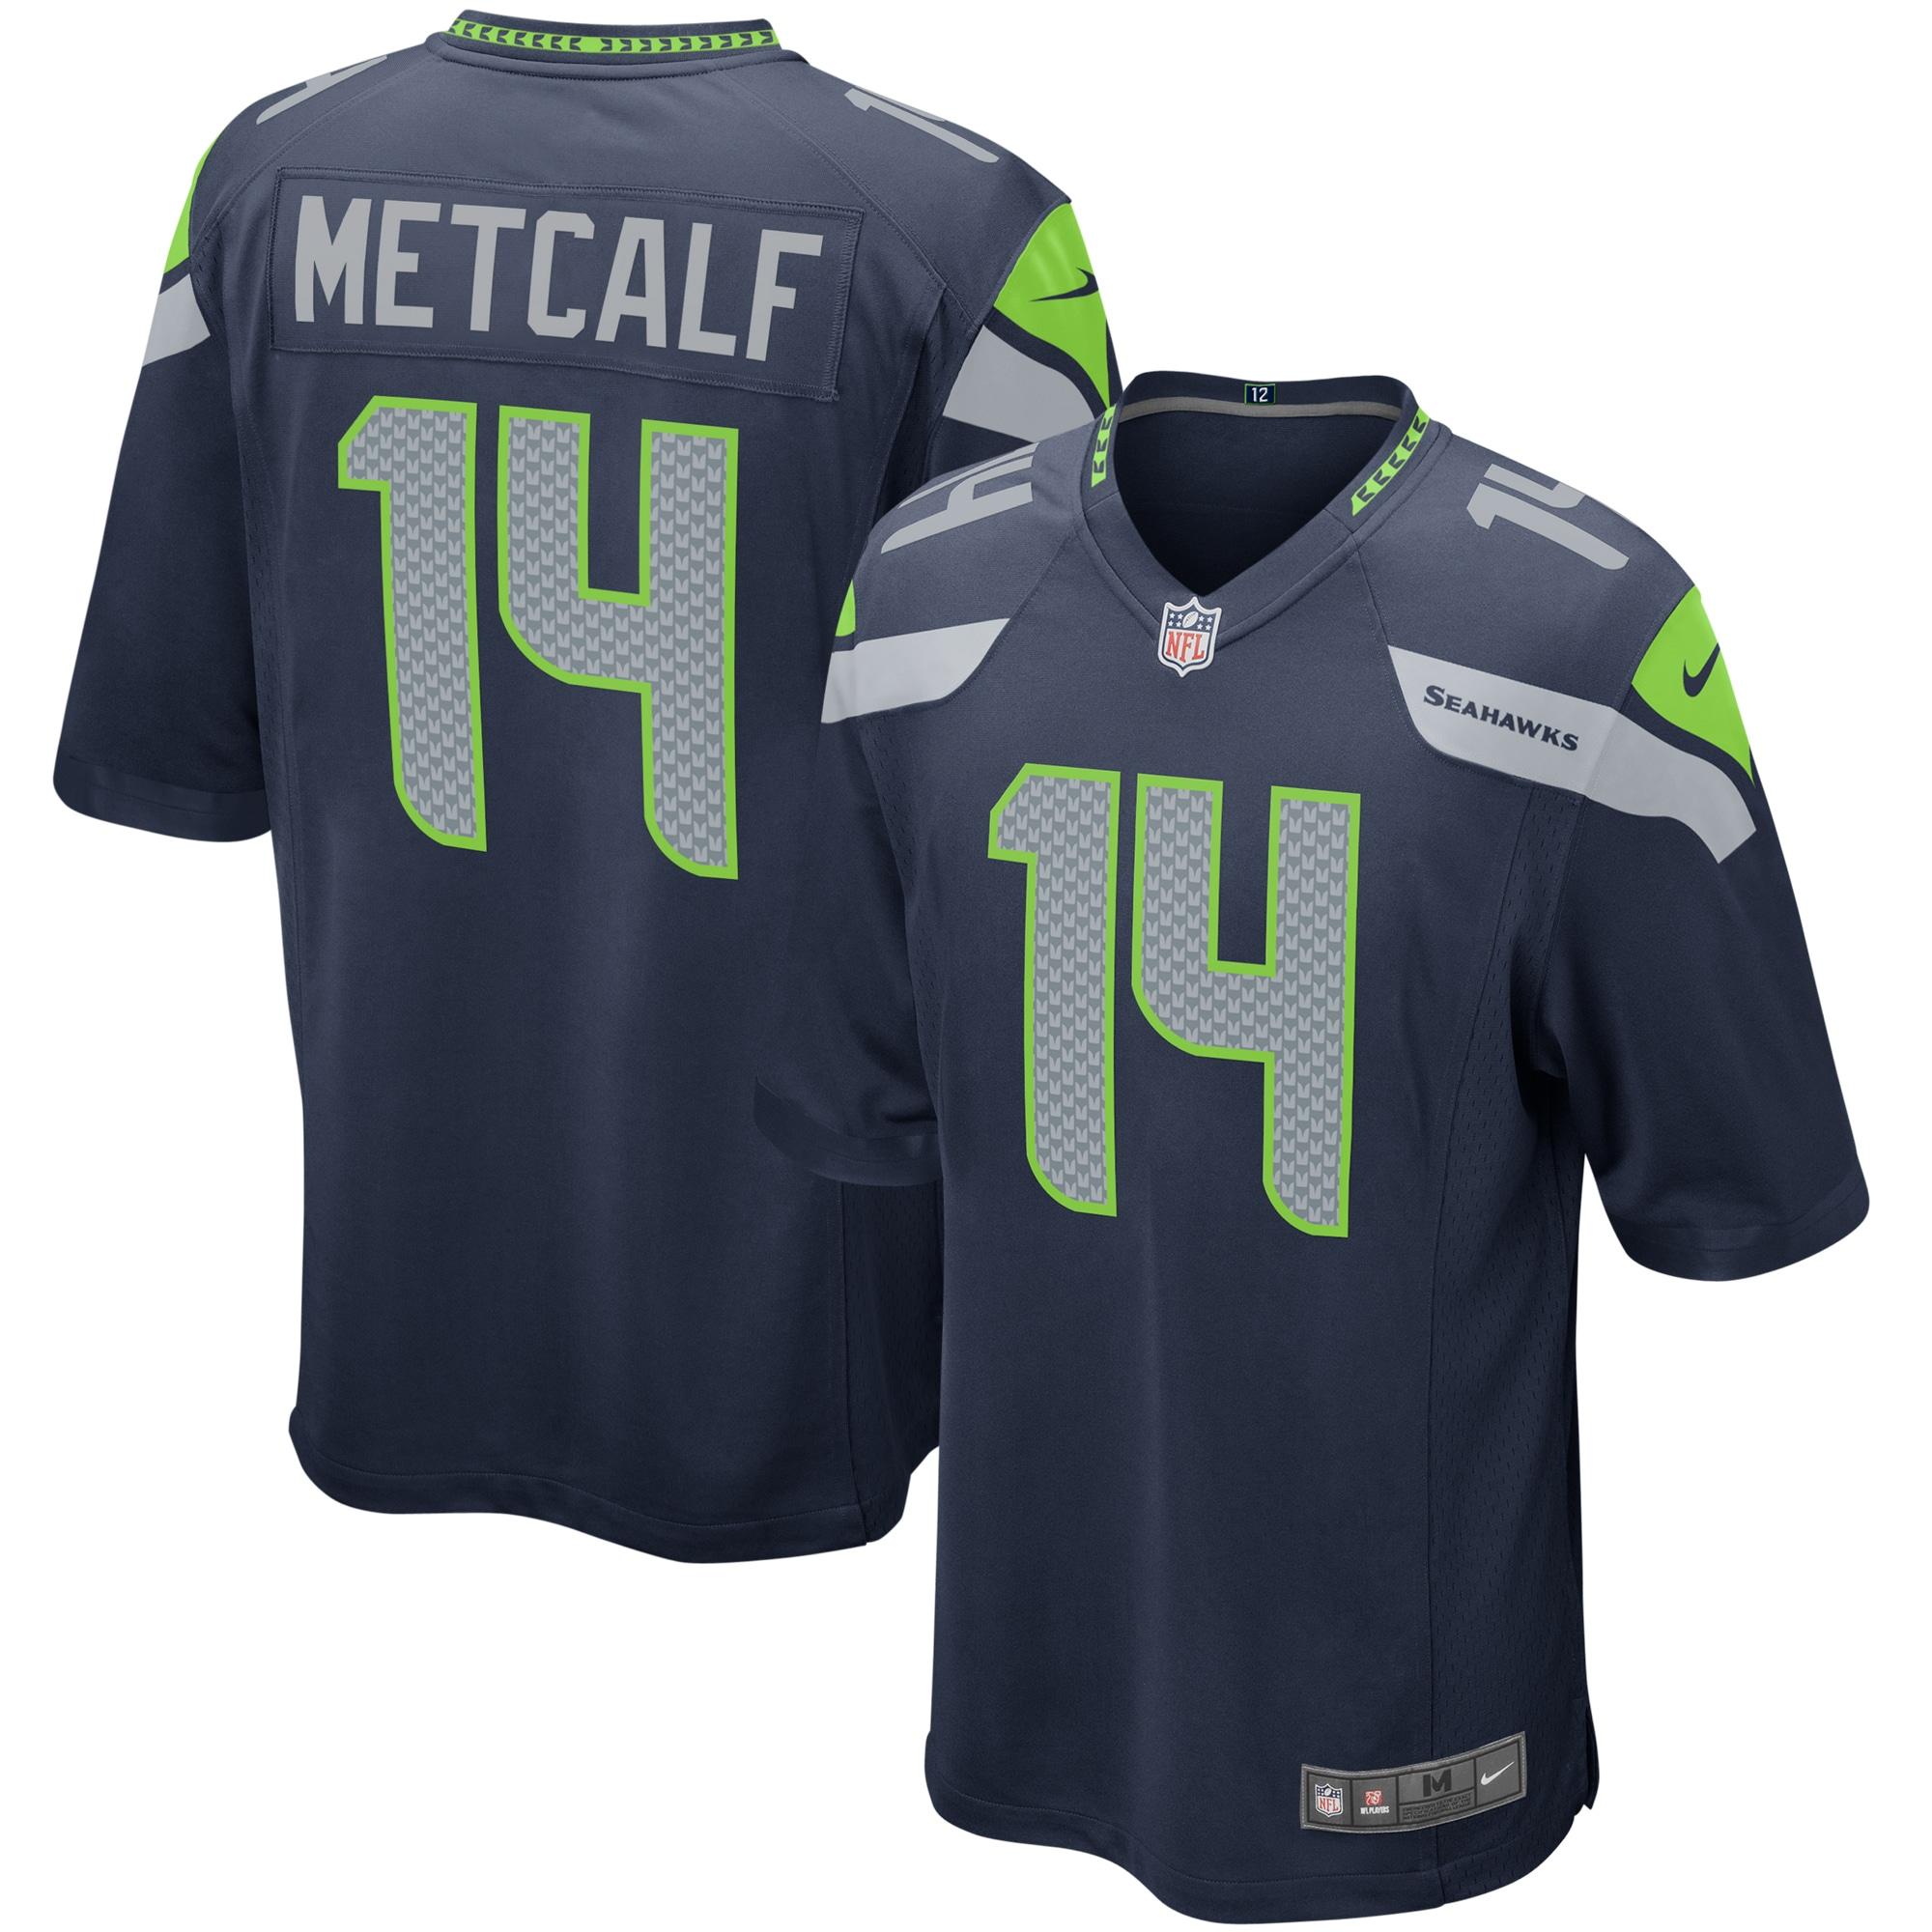 DK Metcalf Seattle Seahawks Nike Game Player Jersey - Navy